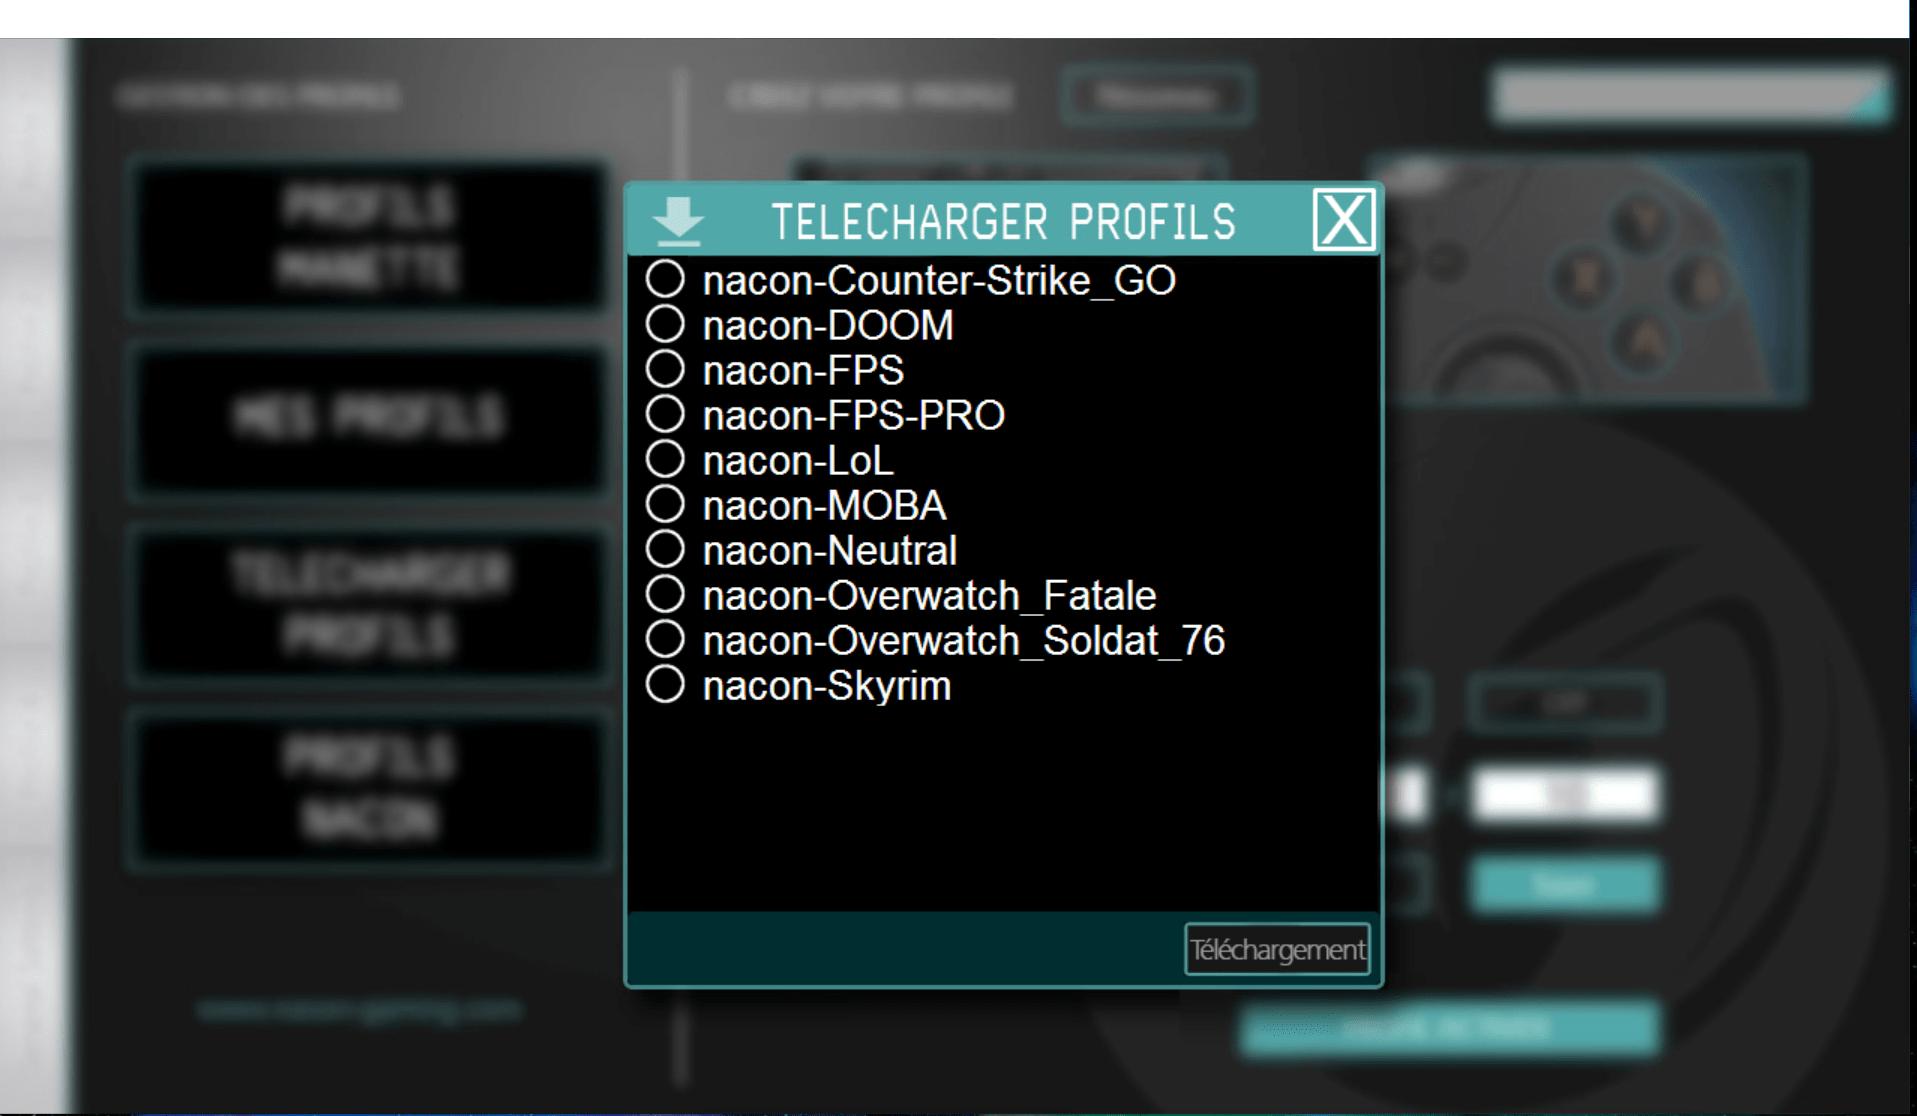 Telecharger profils